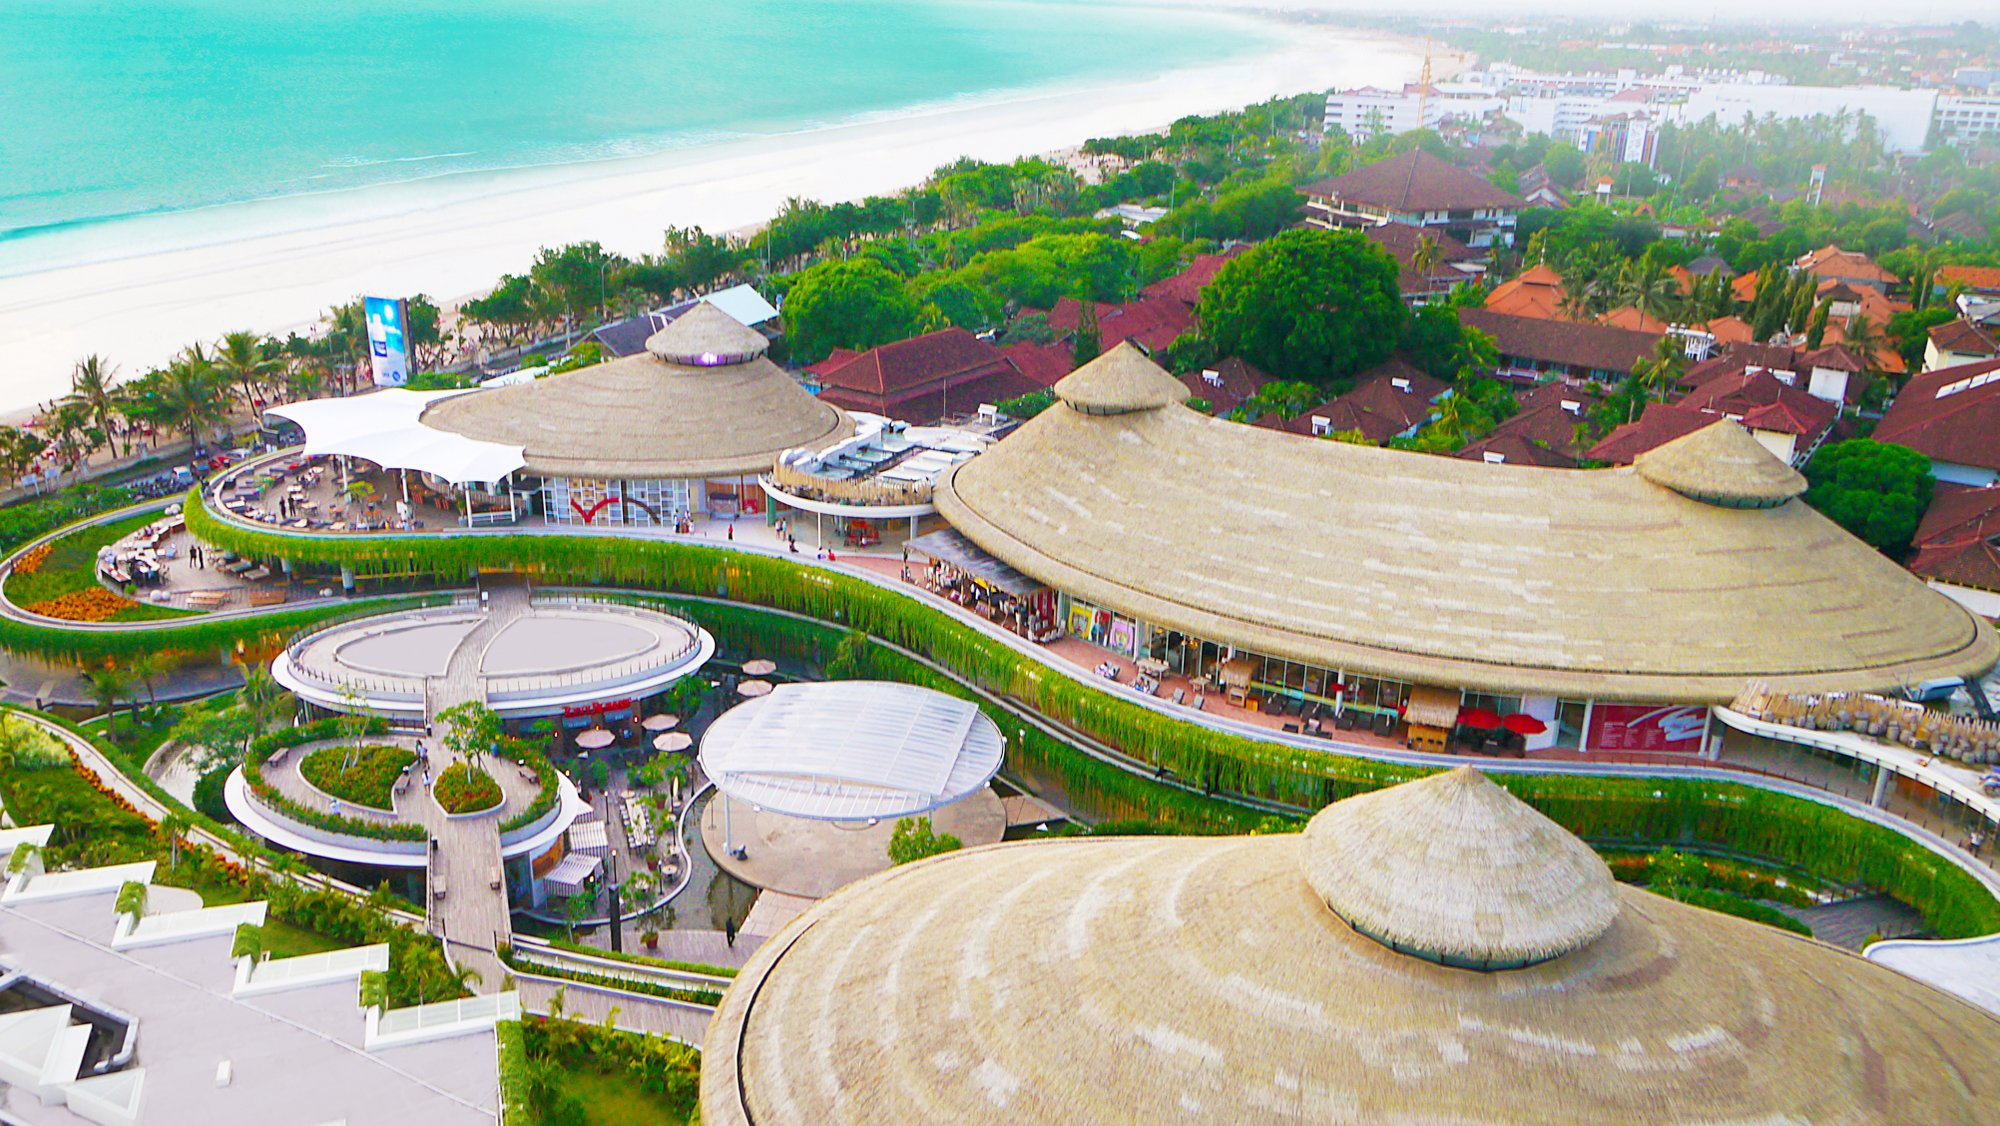 Beachwalk Shopping Center, Bali